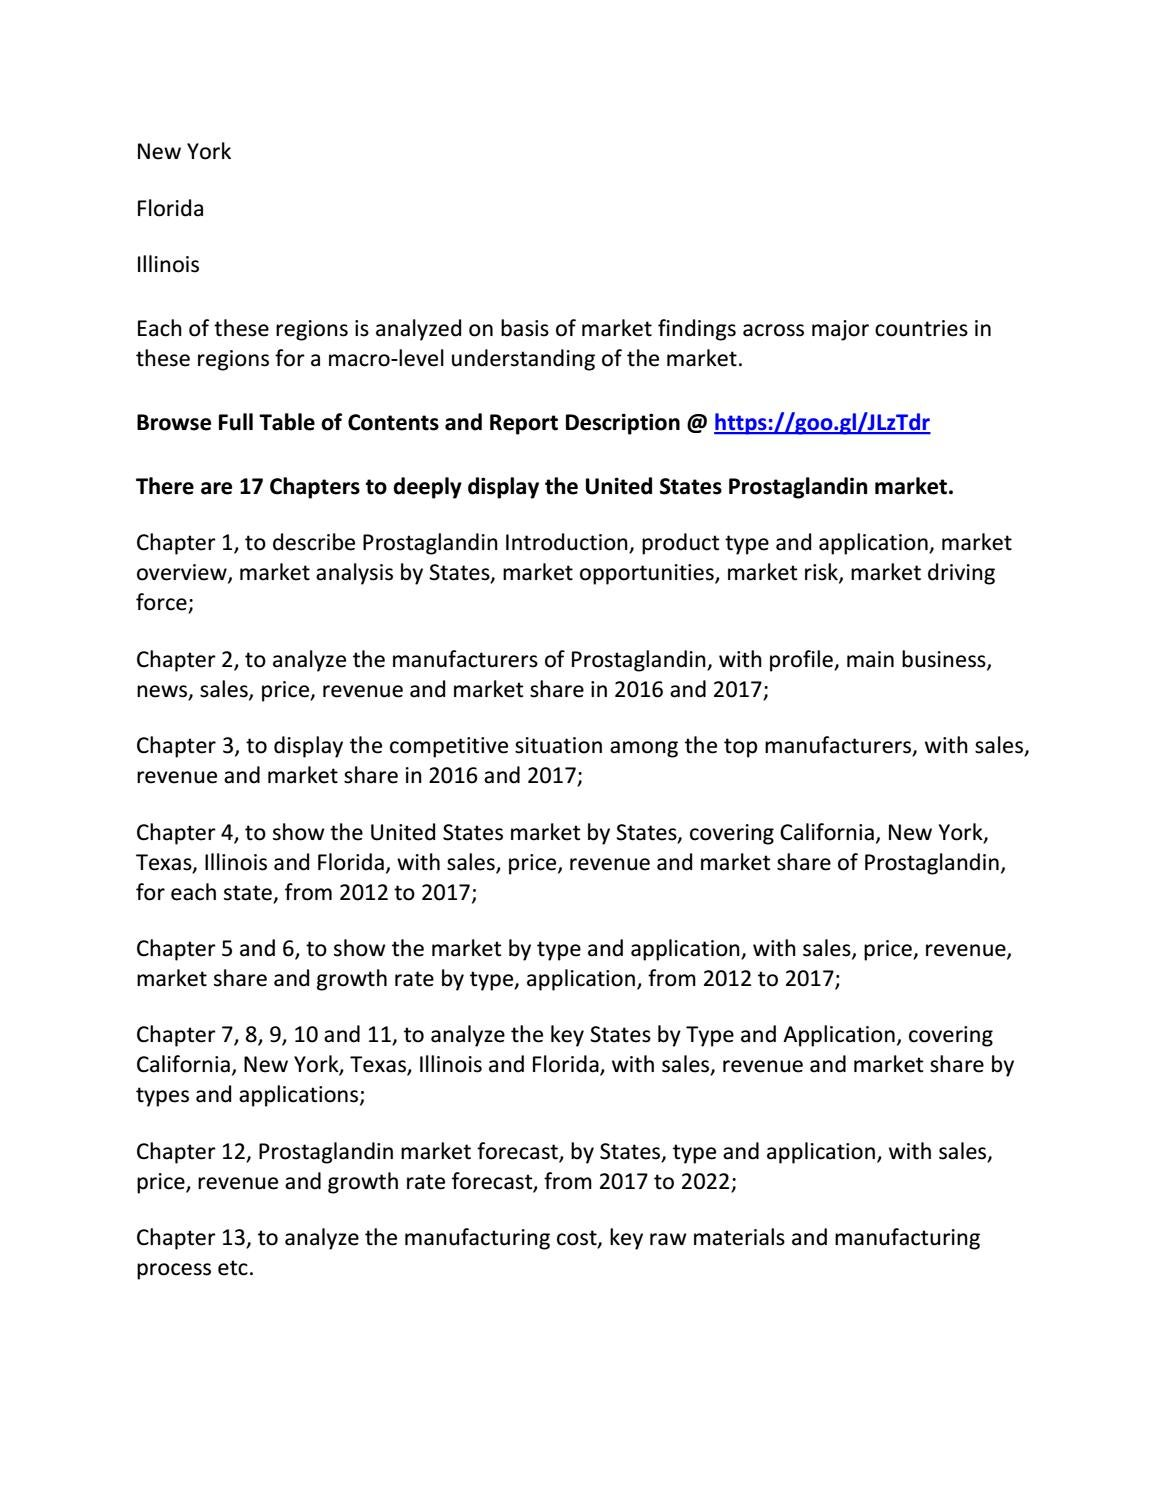 United States Prostaglandin Market 2017